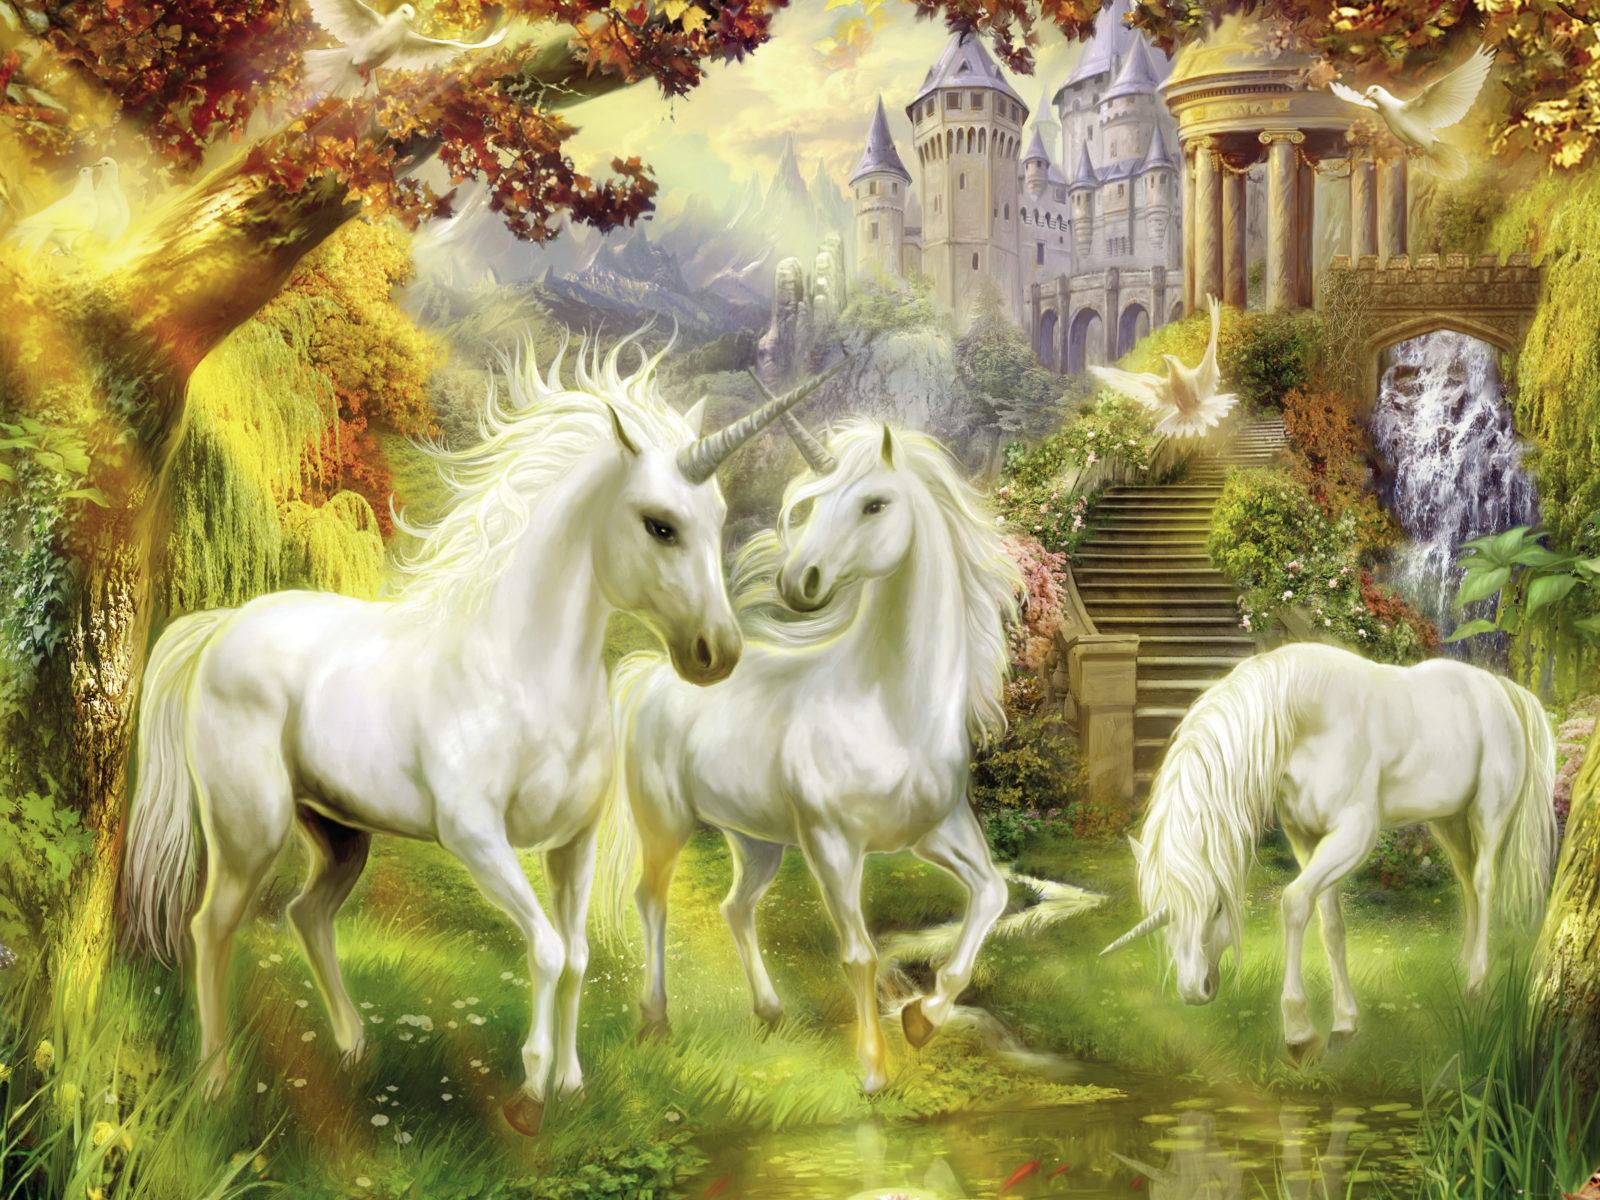 Si te gusta este animal, te brindaremos las mejores imagenes de unicornio totalmente. Unicorn Horse In Paradise Desktop Wallpaper Fairytale